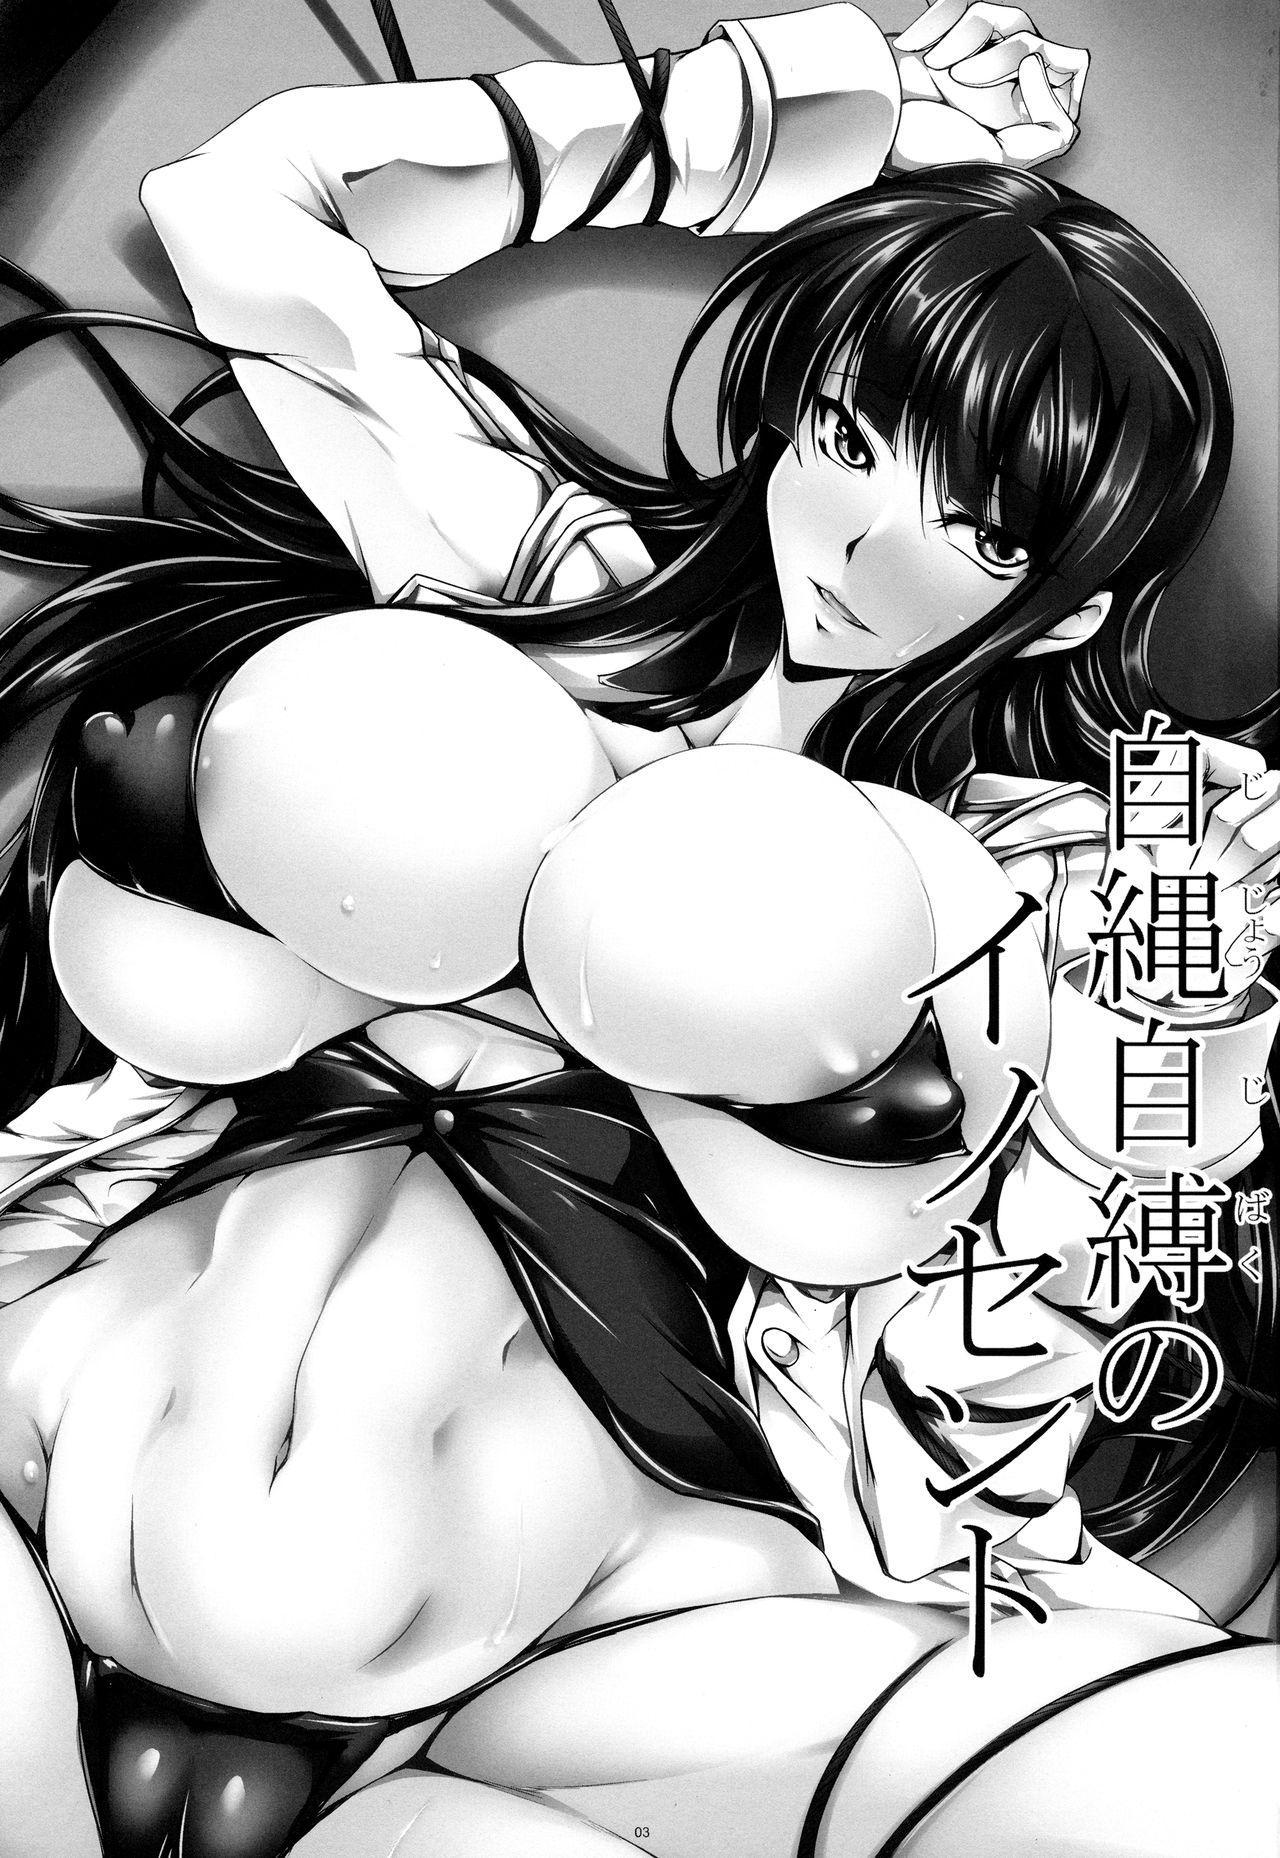 Jijoujibaku no Innocent | Innocent Caught in Her Own Trap 1